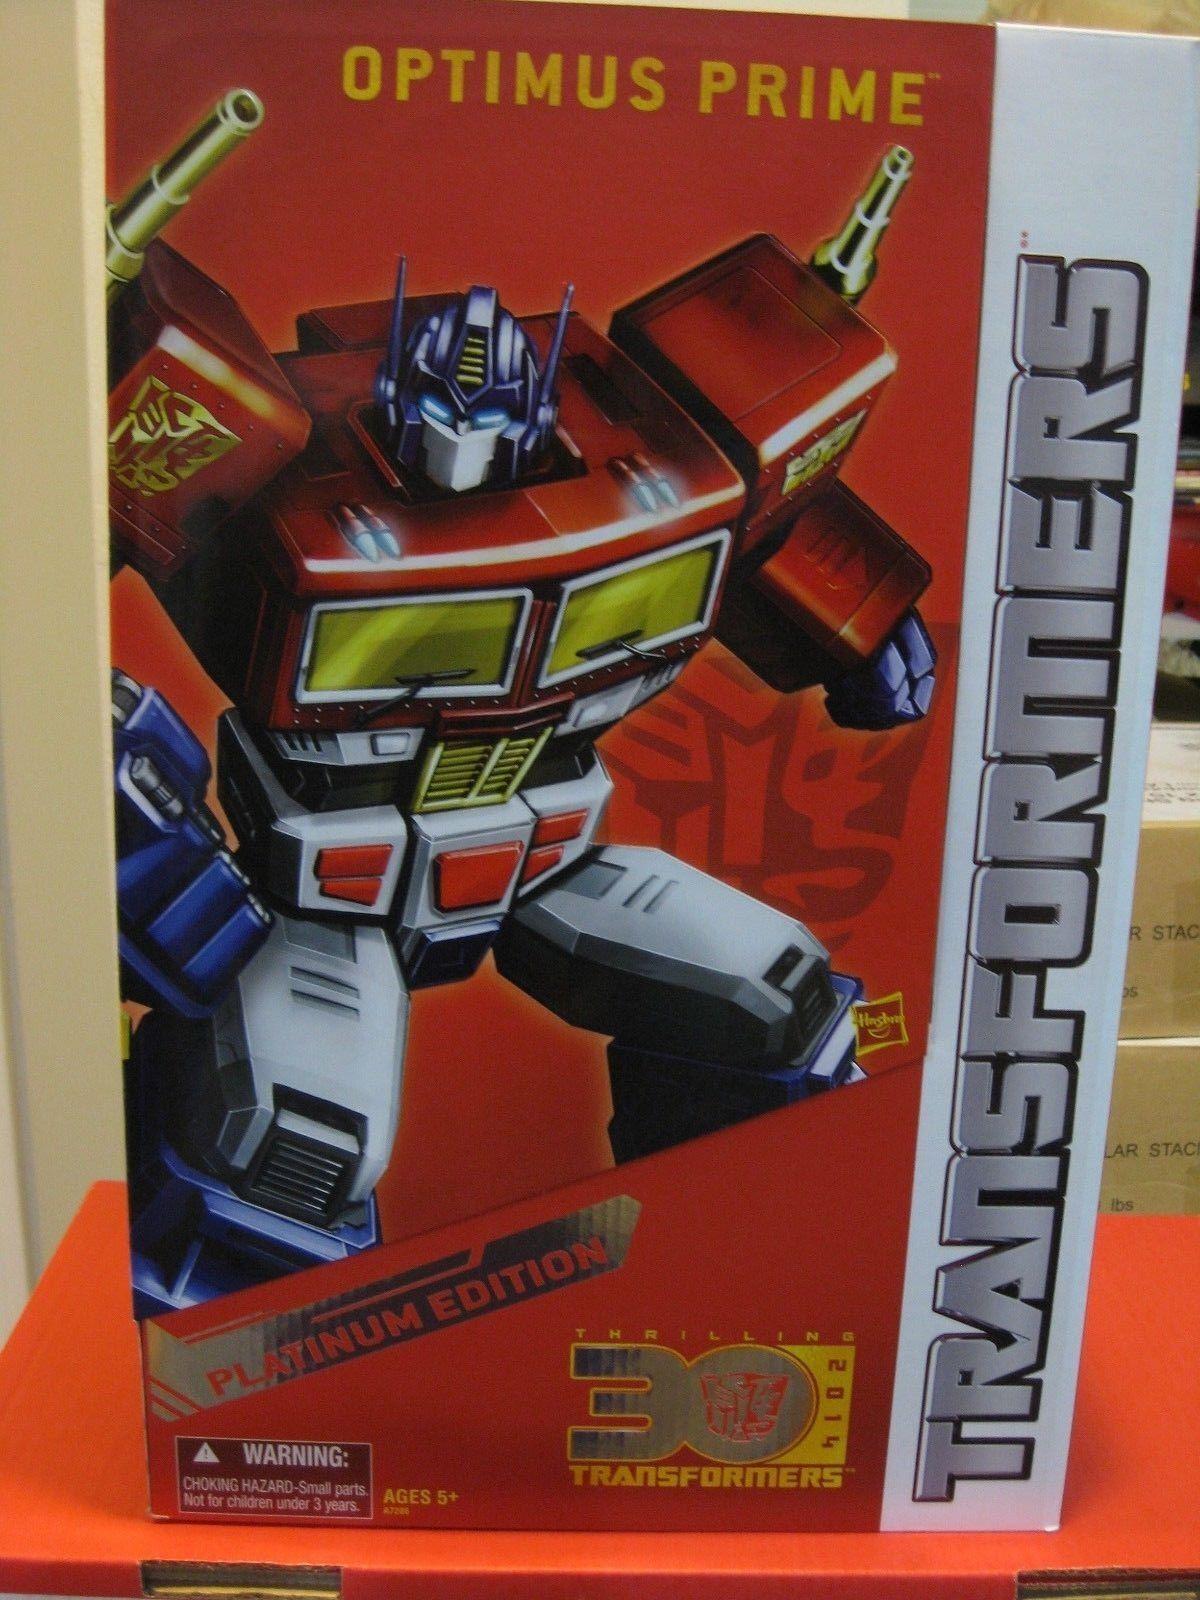 Transformers Masterpiece Platinum Edition Year of the Horse Optimus Prime